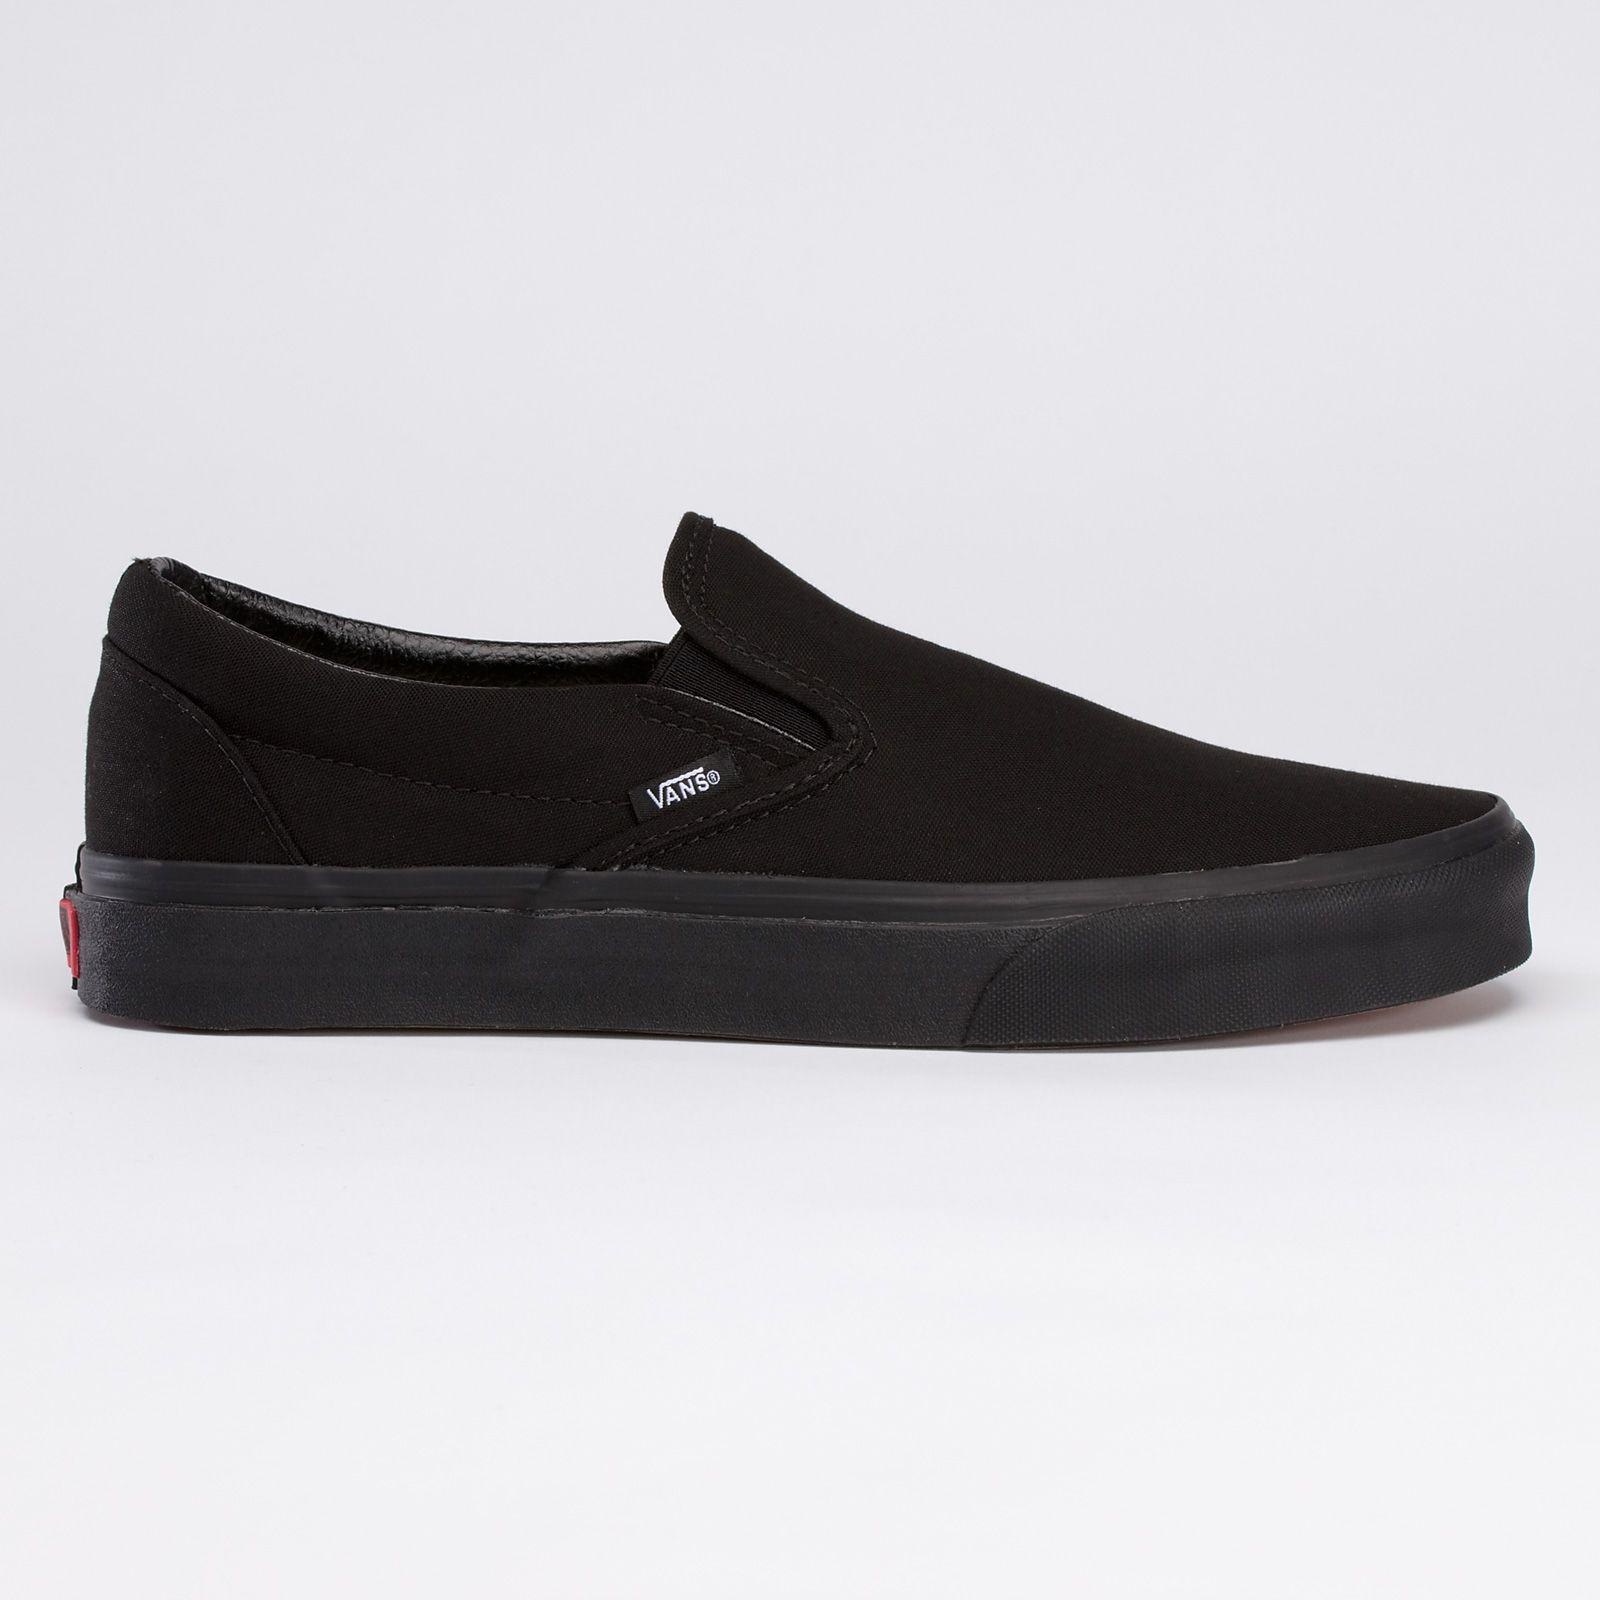 Vans Black Slip on Shoe for wedding | Zapatillas panchas